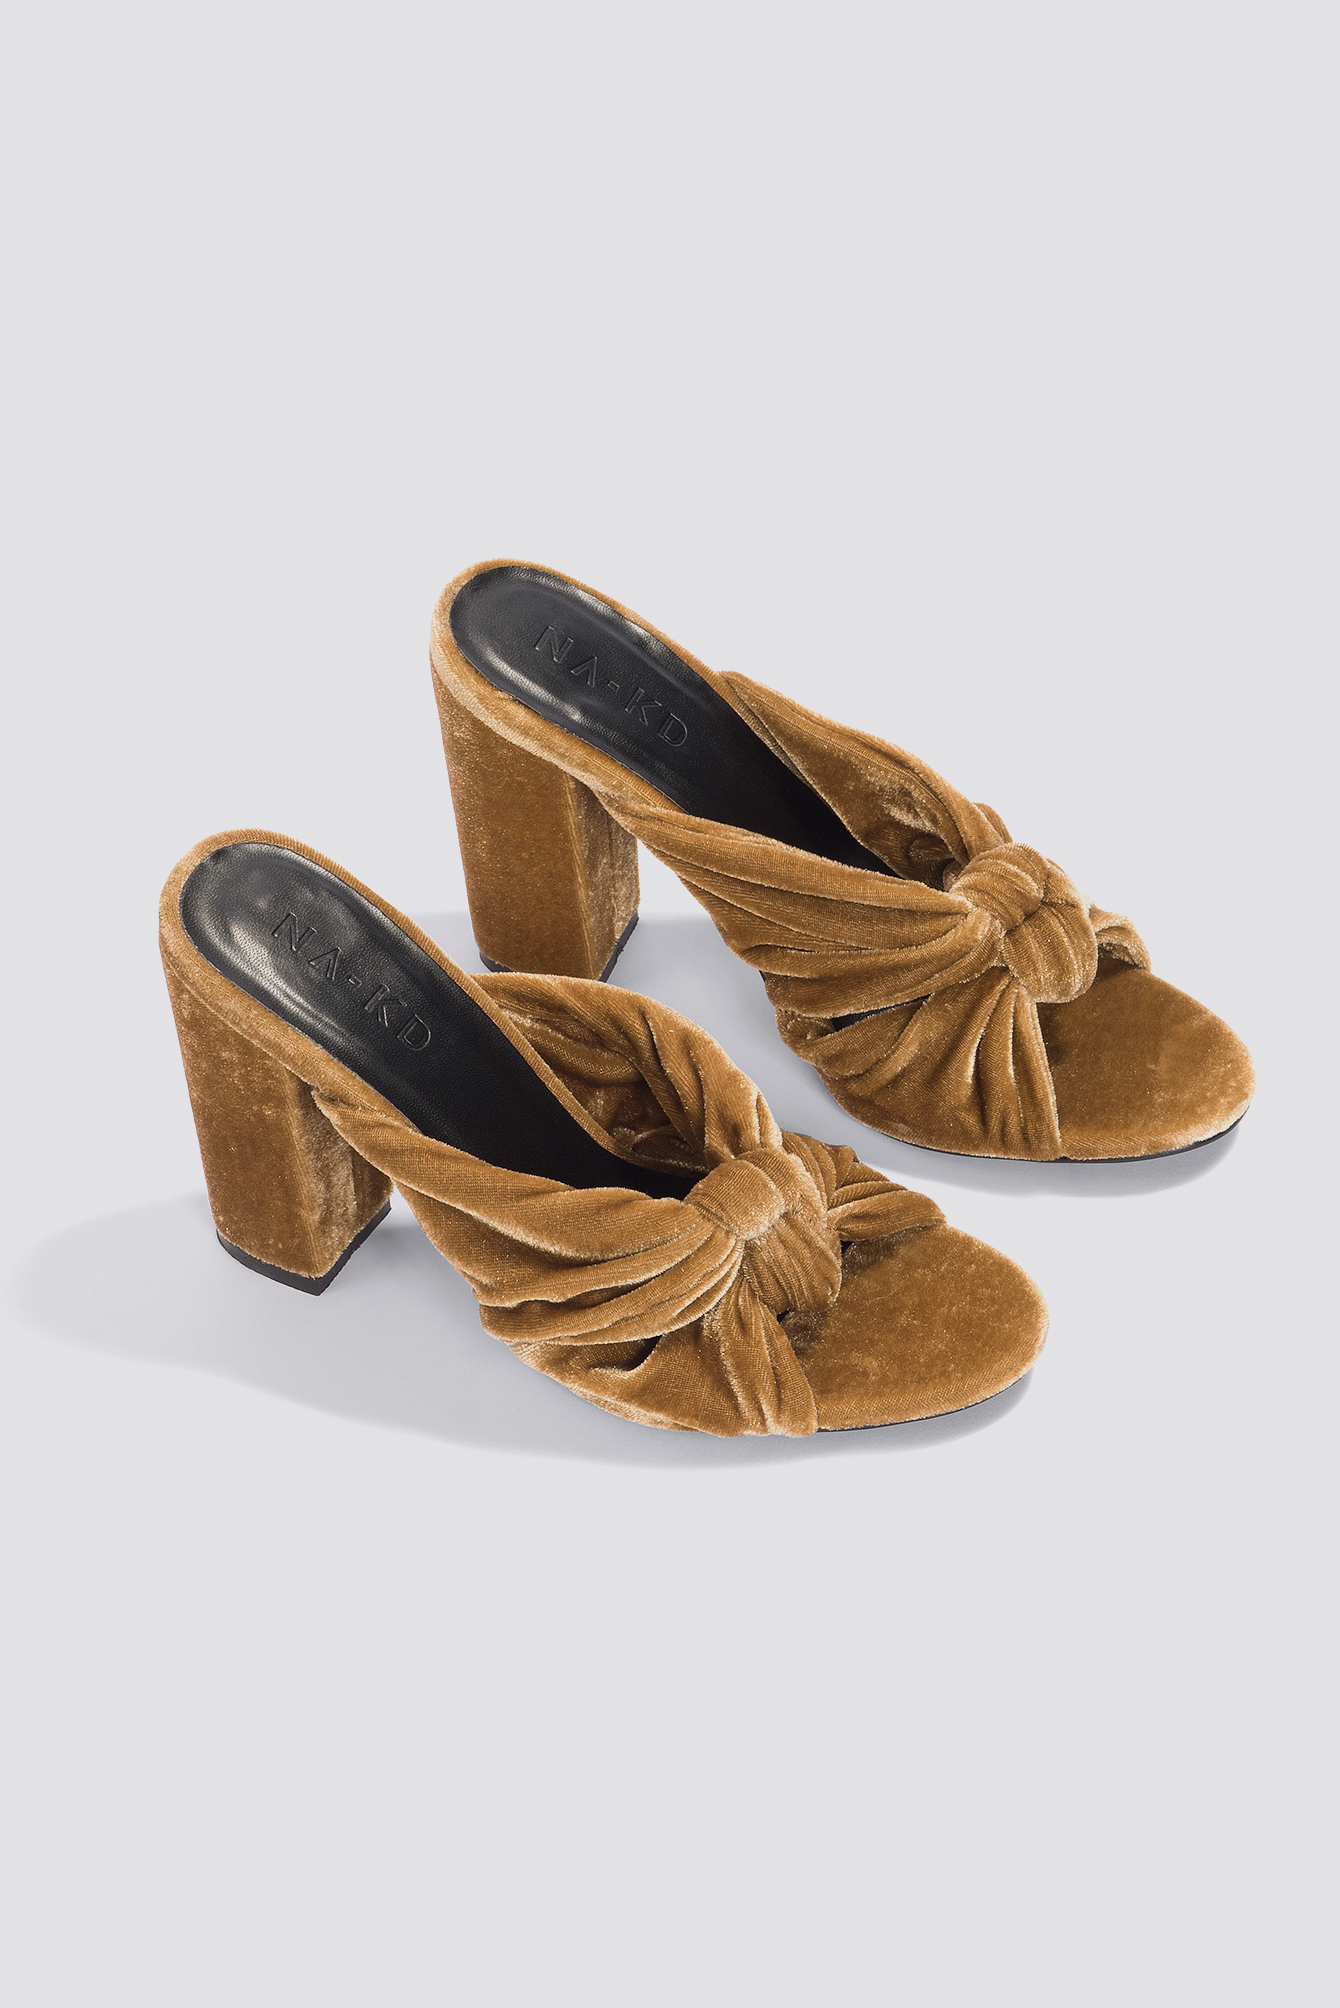 na-kd shoes -  Velvet Knot Mule Heels - Brown,Gold